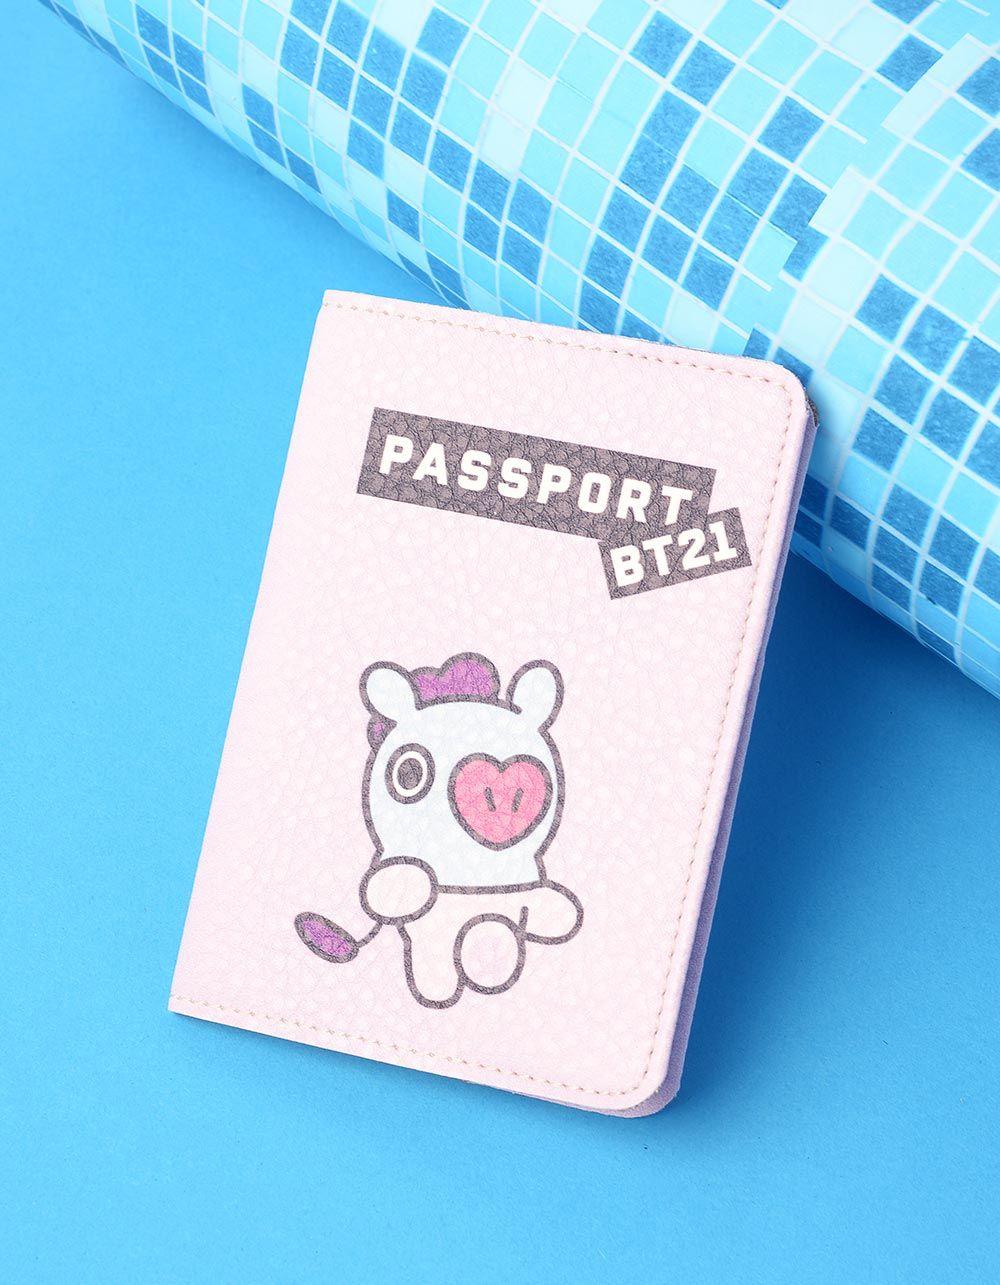 Обкладинка на паспорт з bts bt21 MANG  Хосок   237250-35-XX